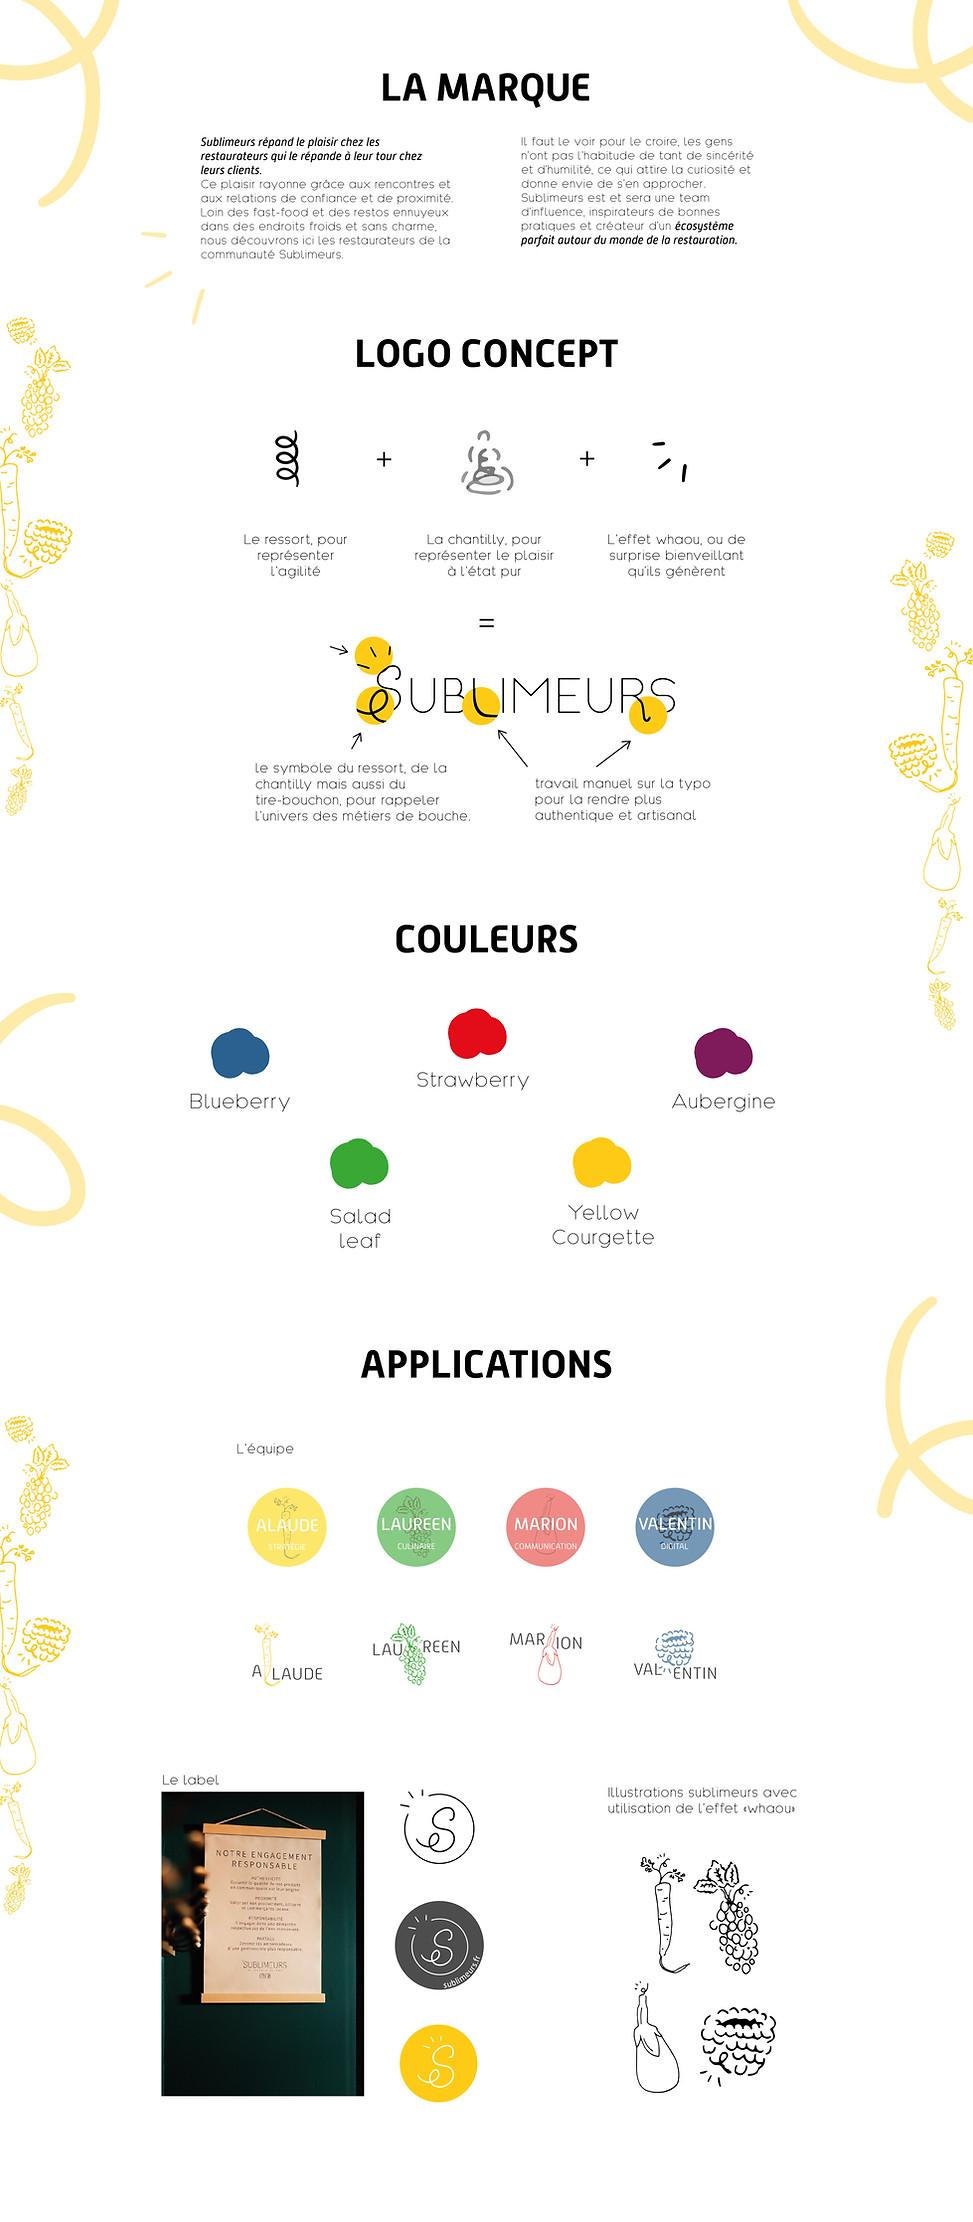 sublimeurs_logoconcept-02.jpg